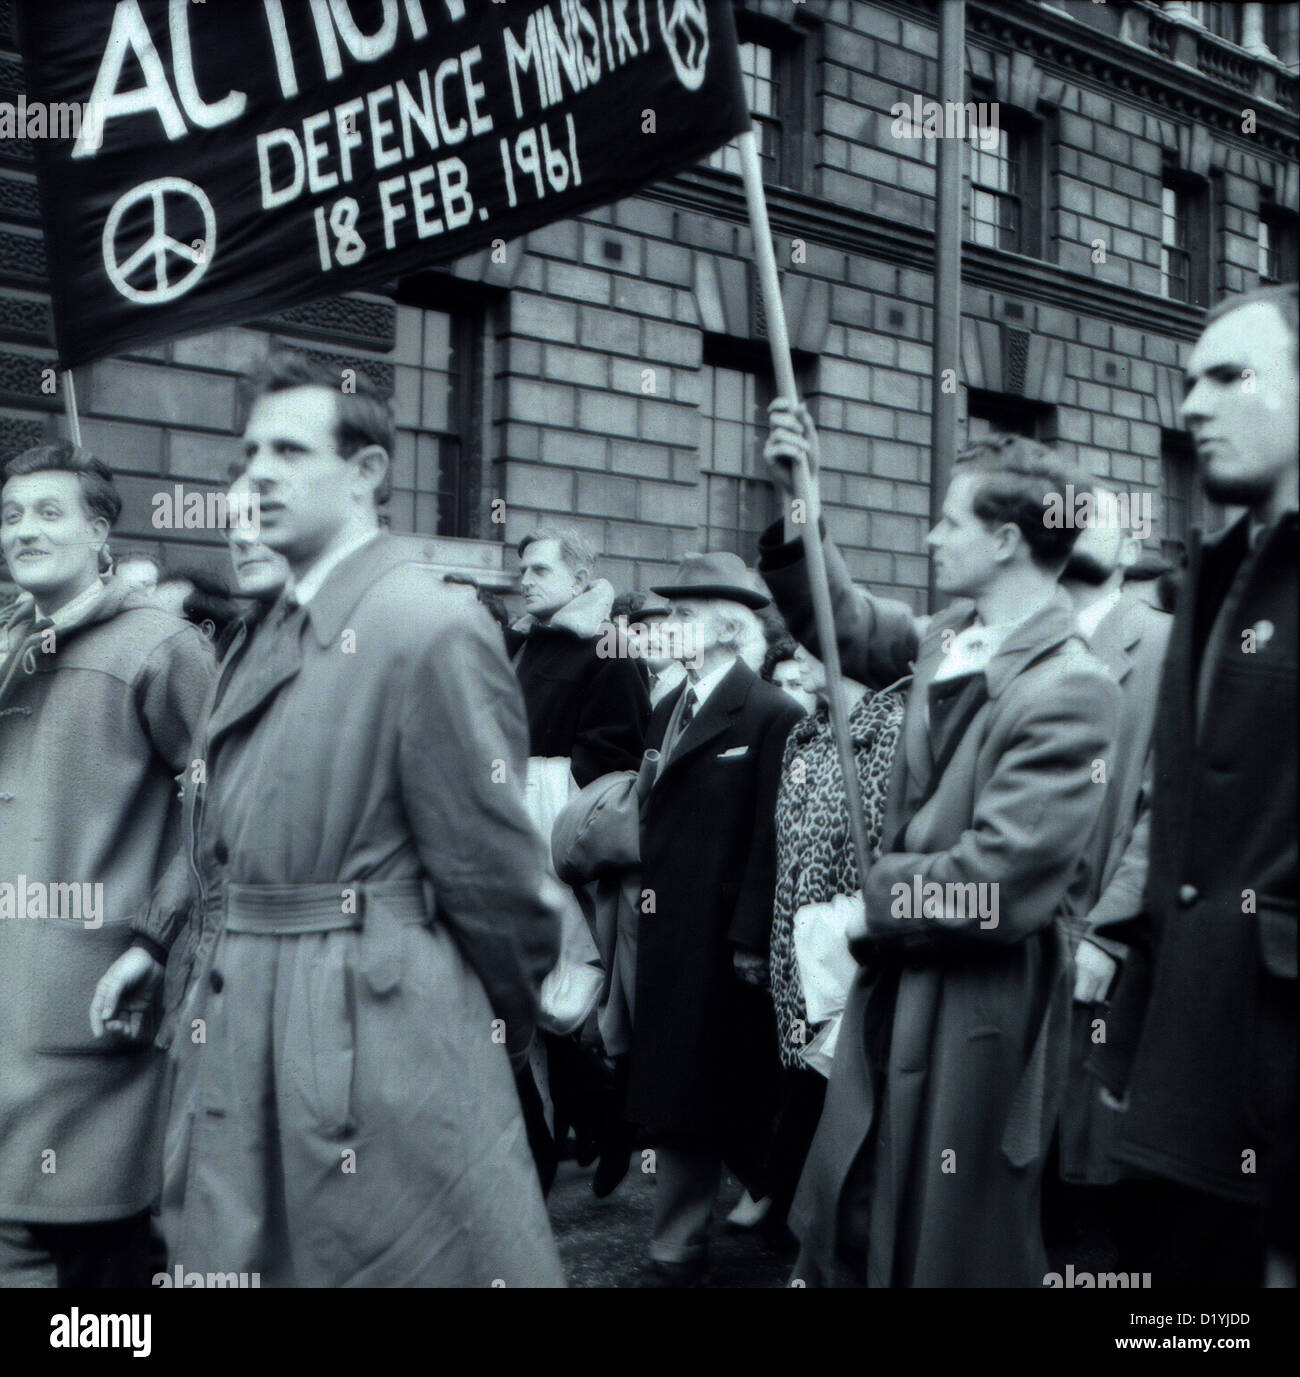 Bertrand Russell  logician mathematician historian social critic anti-war activist nuclear disarmament humanitarian - Stock Image